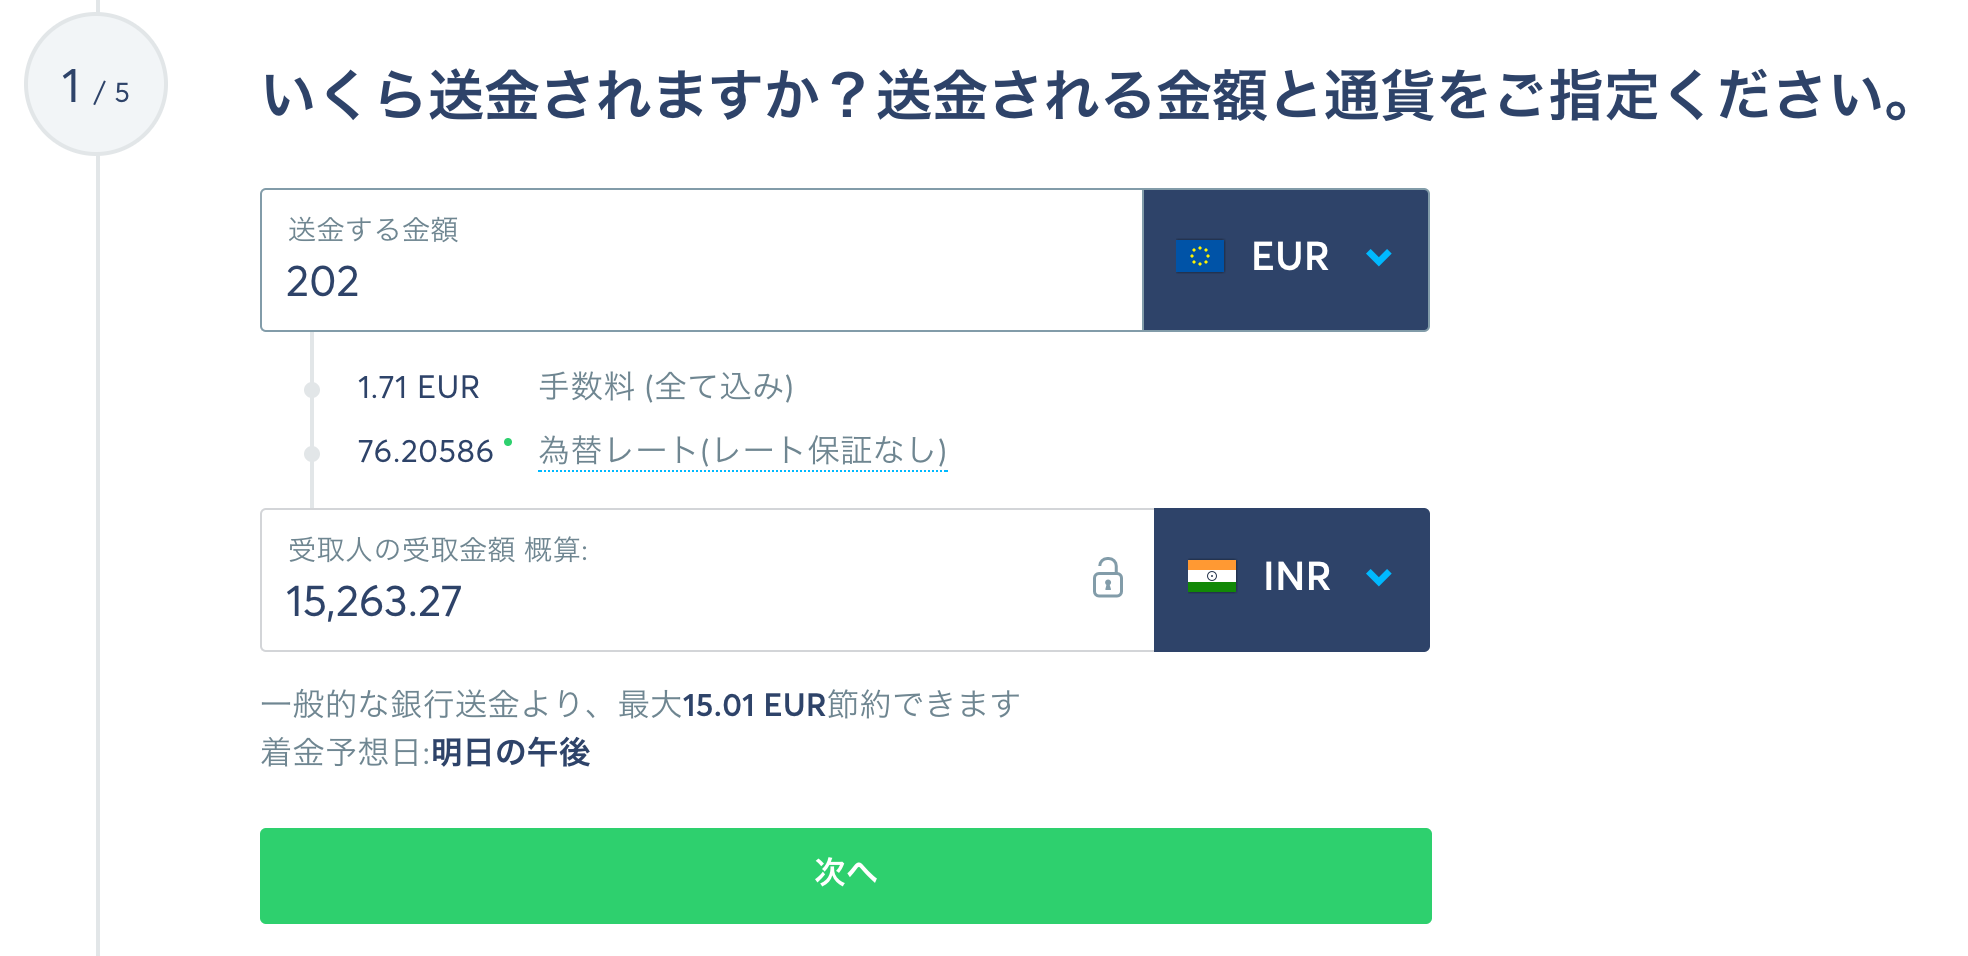 Transferwise送金額を指定する